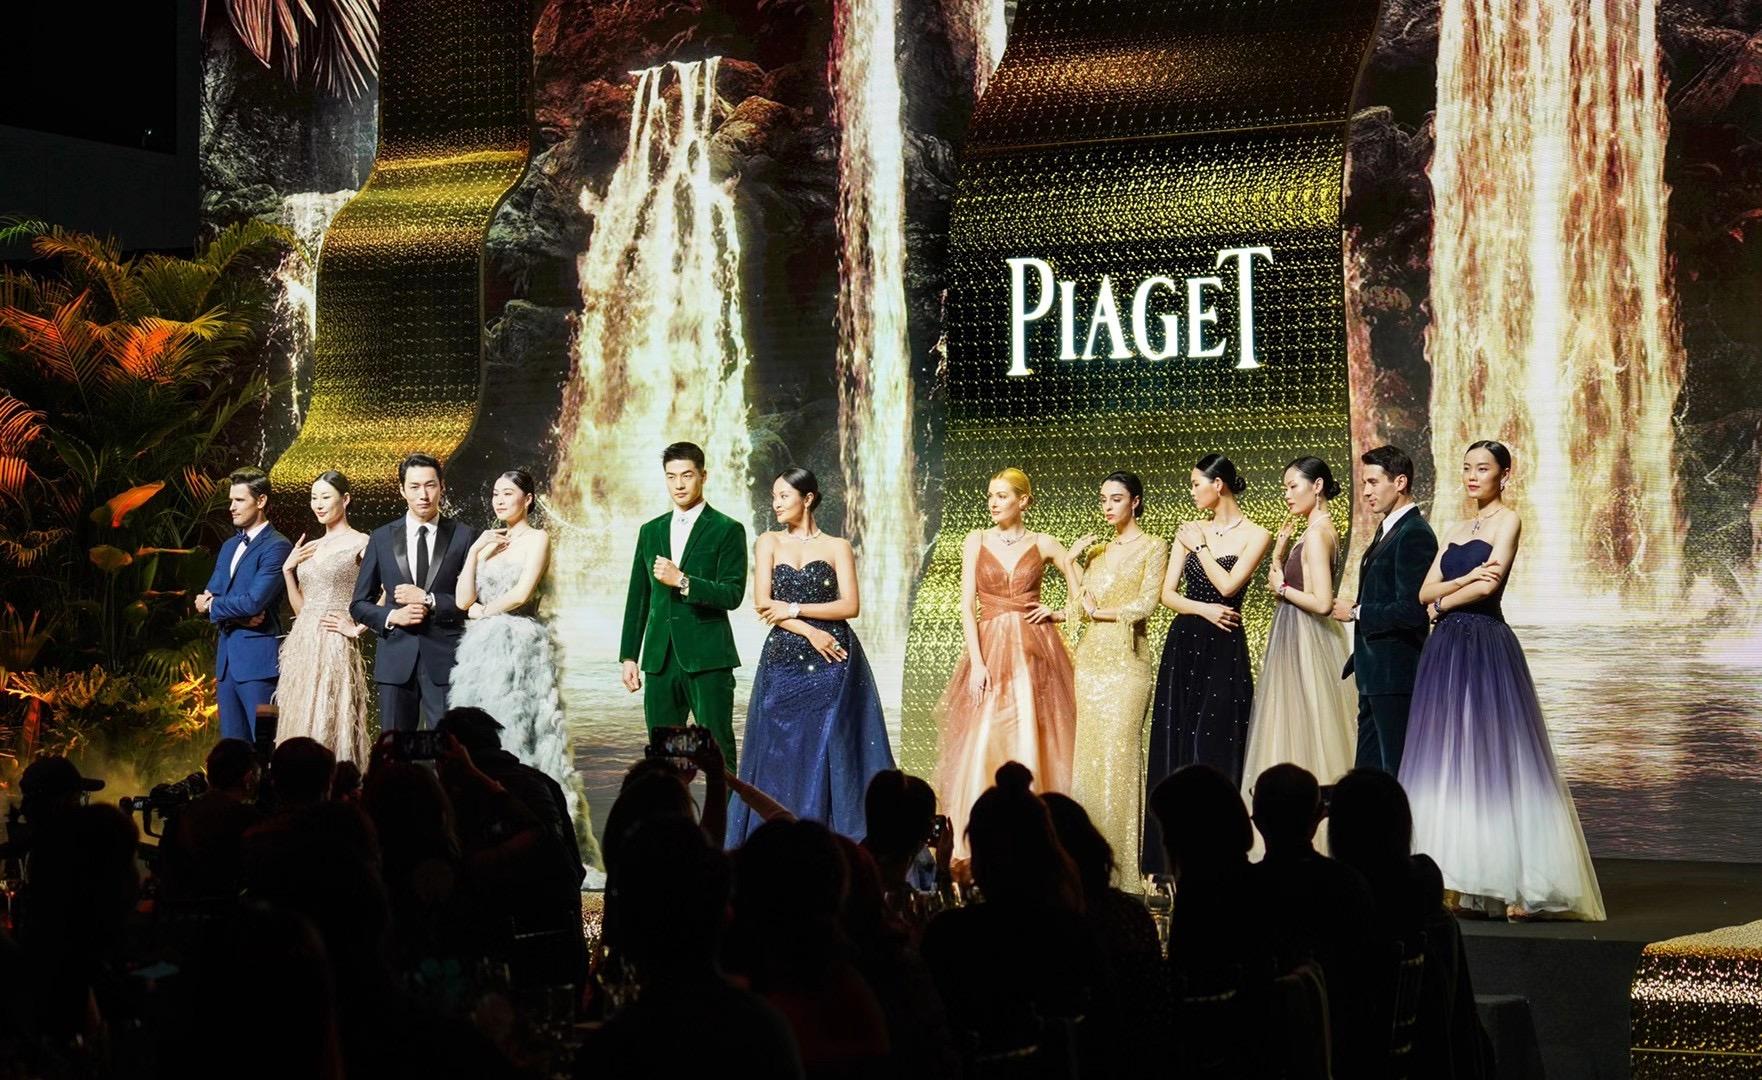 Piaget HJ Exhibition & Gala Dinner December 10th-12th Hanghzou – 2